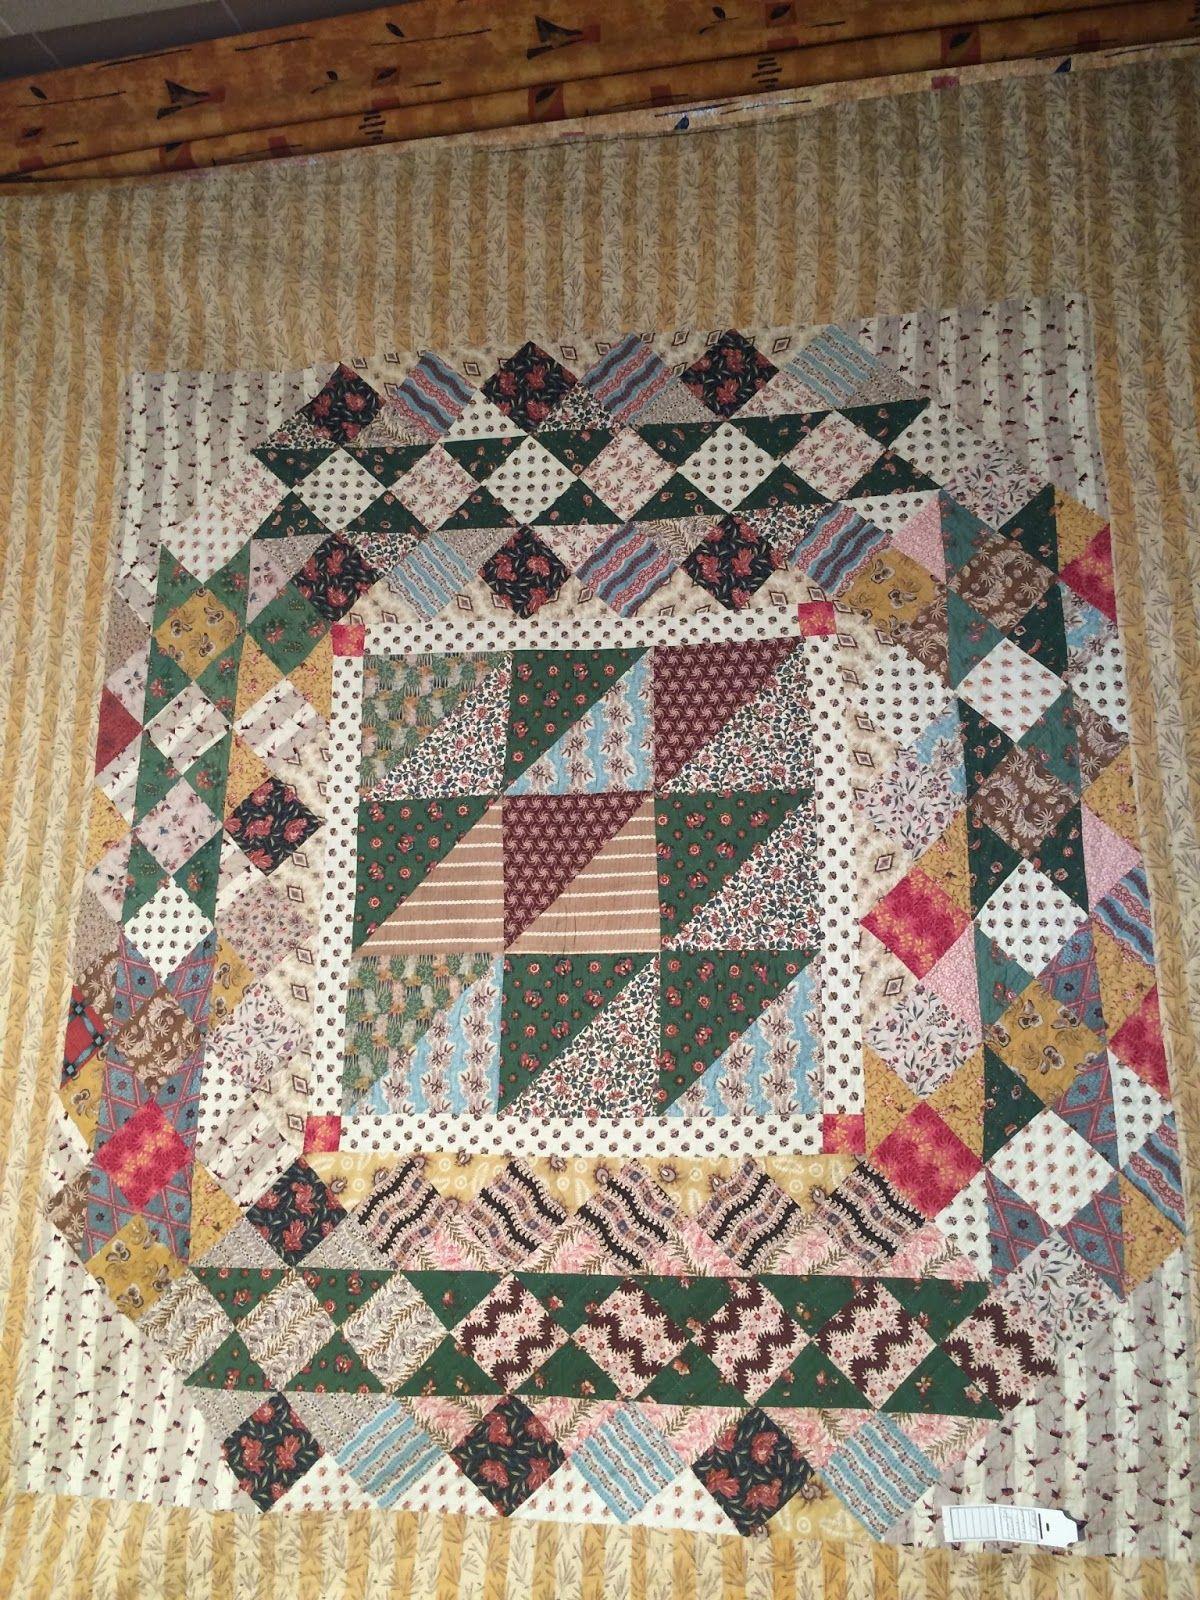 Humble Quilts | Quilts | Pinterest | Medallion quilt, Scrappy ... : humble quilts - Adamdwight.com